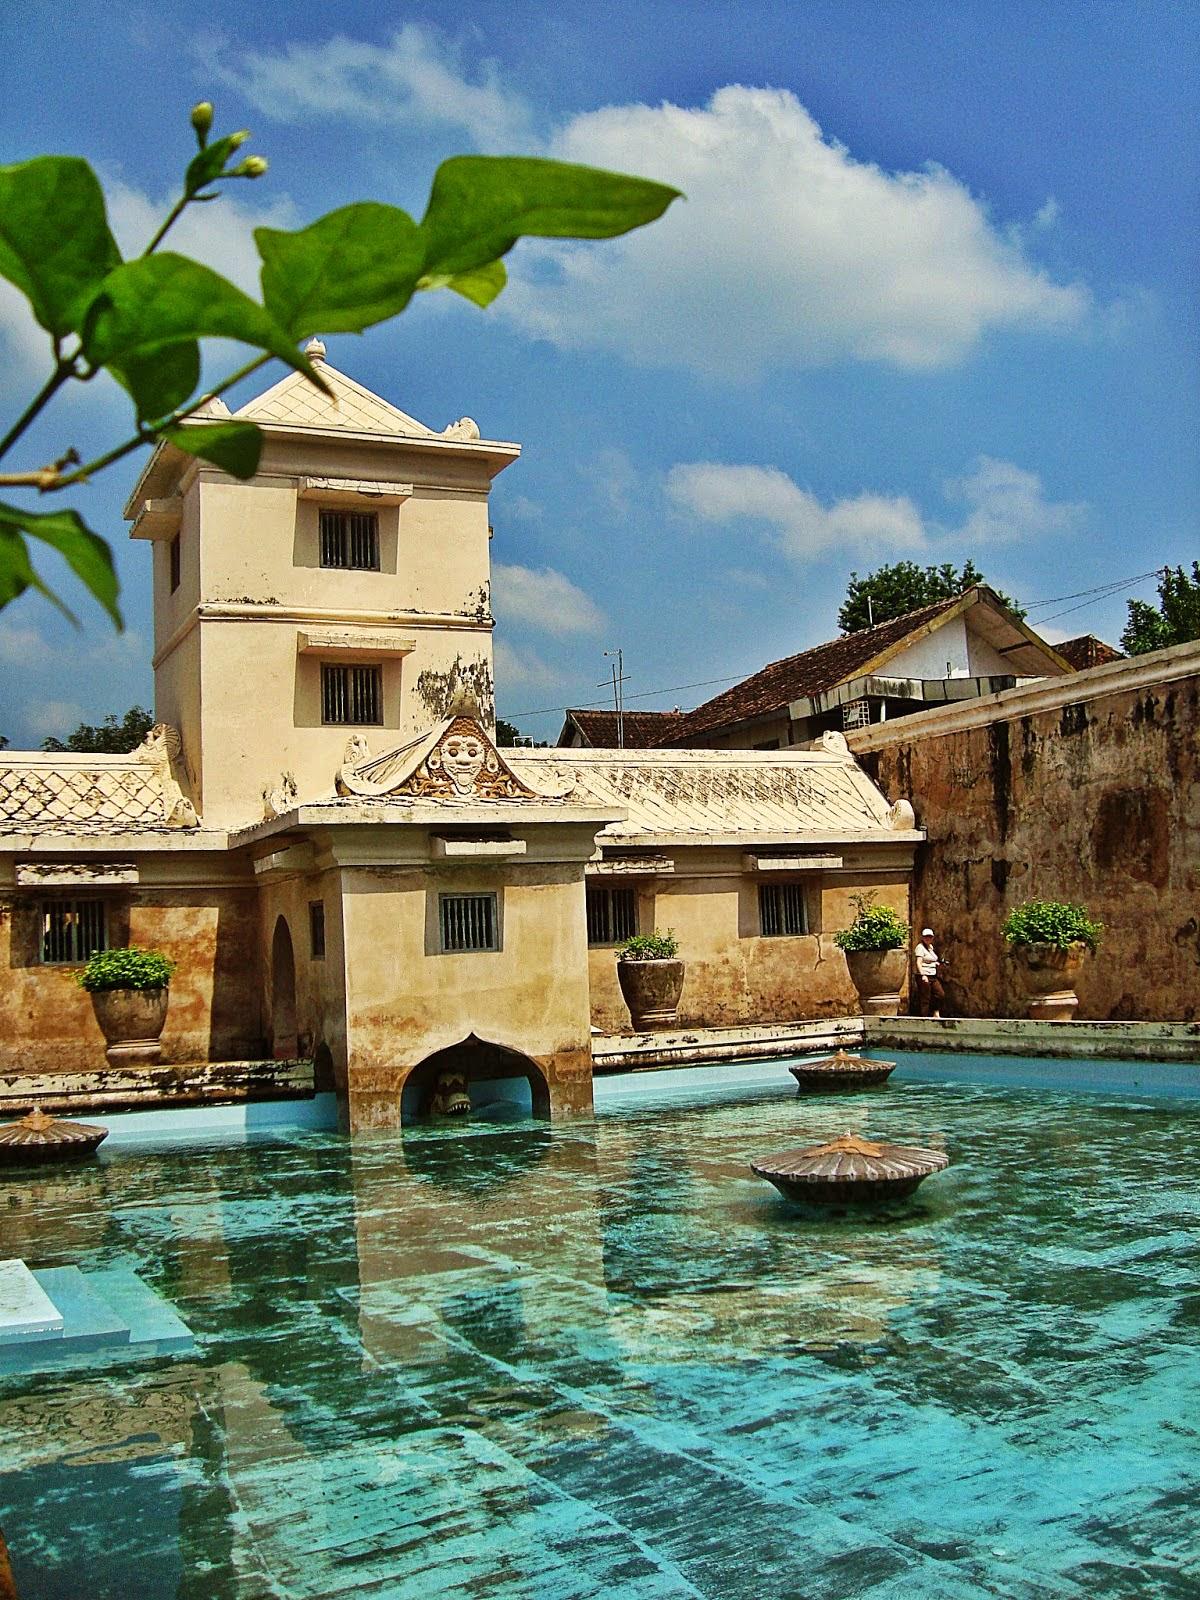 10 Tempat Wisata Yogyakarta yang Wajib Dikunjungi